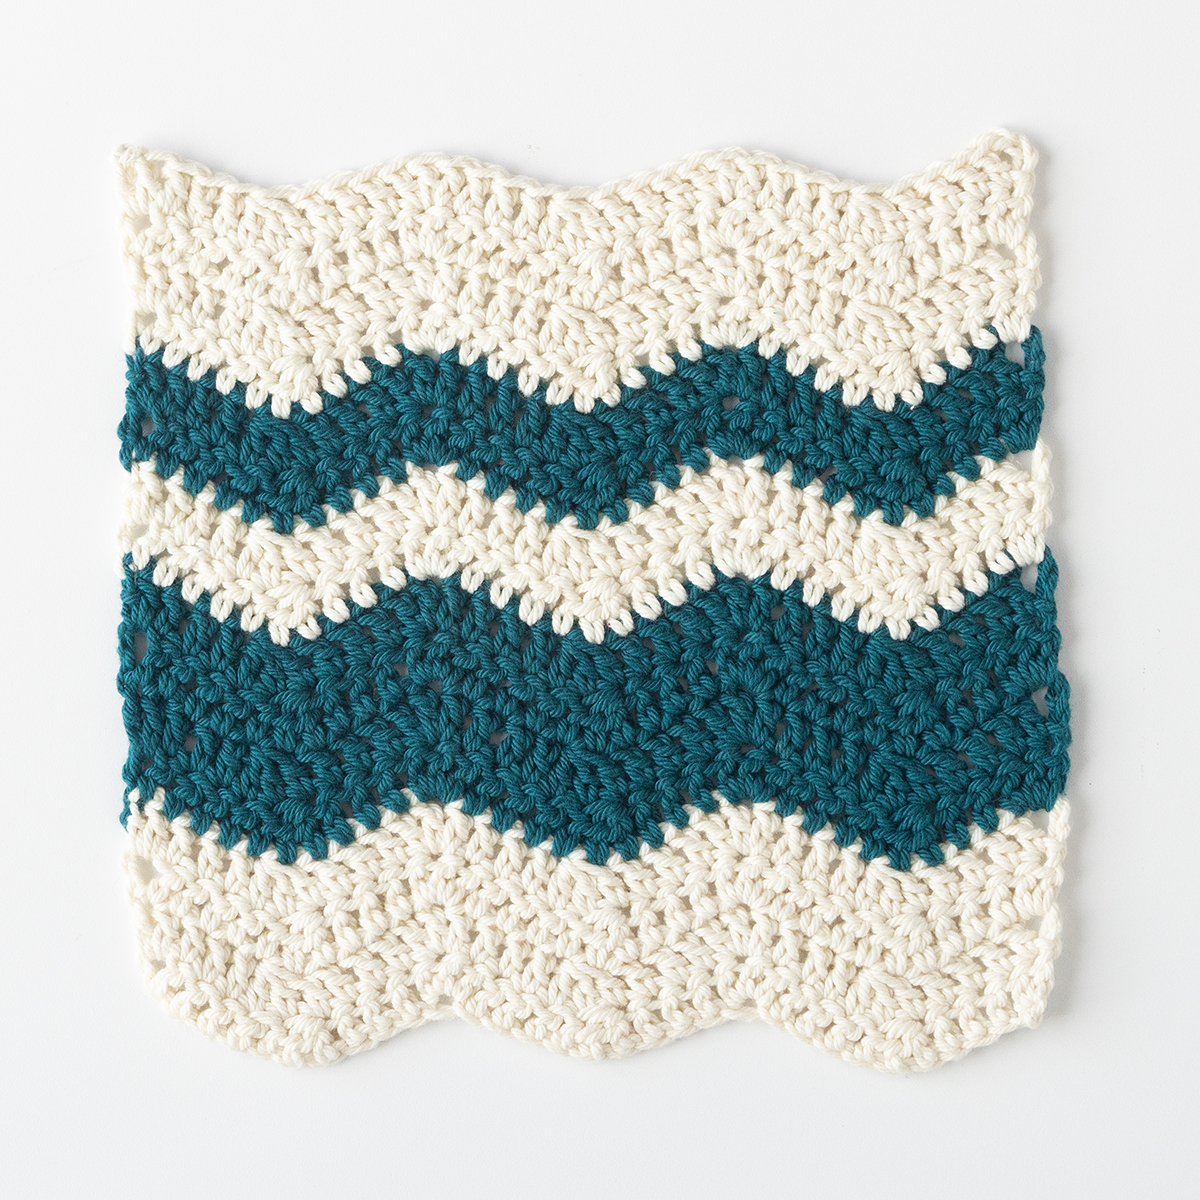 Wavy Chevron Crochet Dishcloth - Knitting Patterns and ...